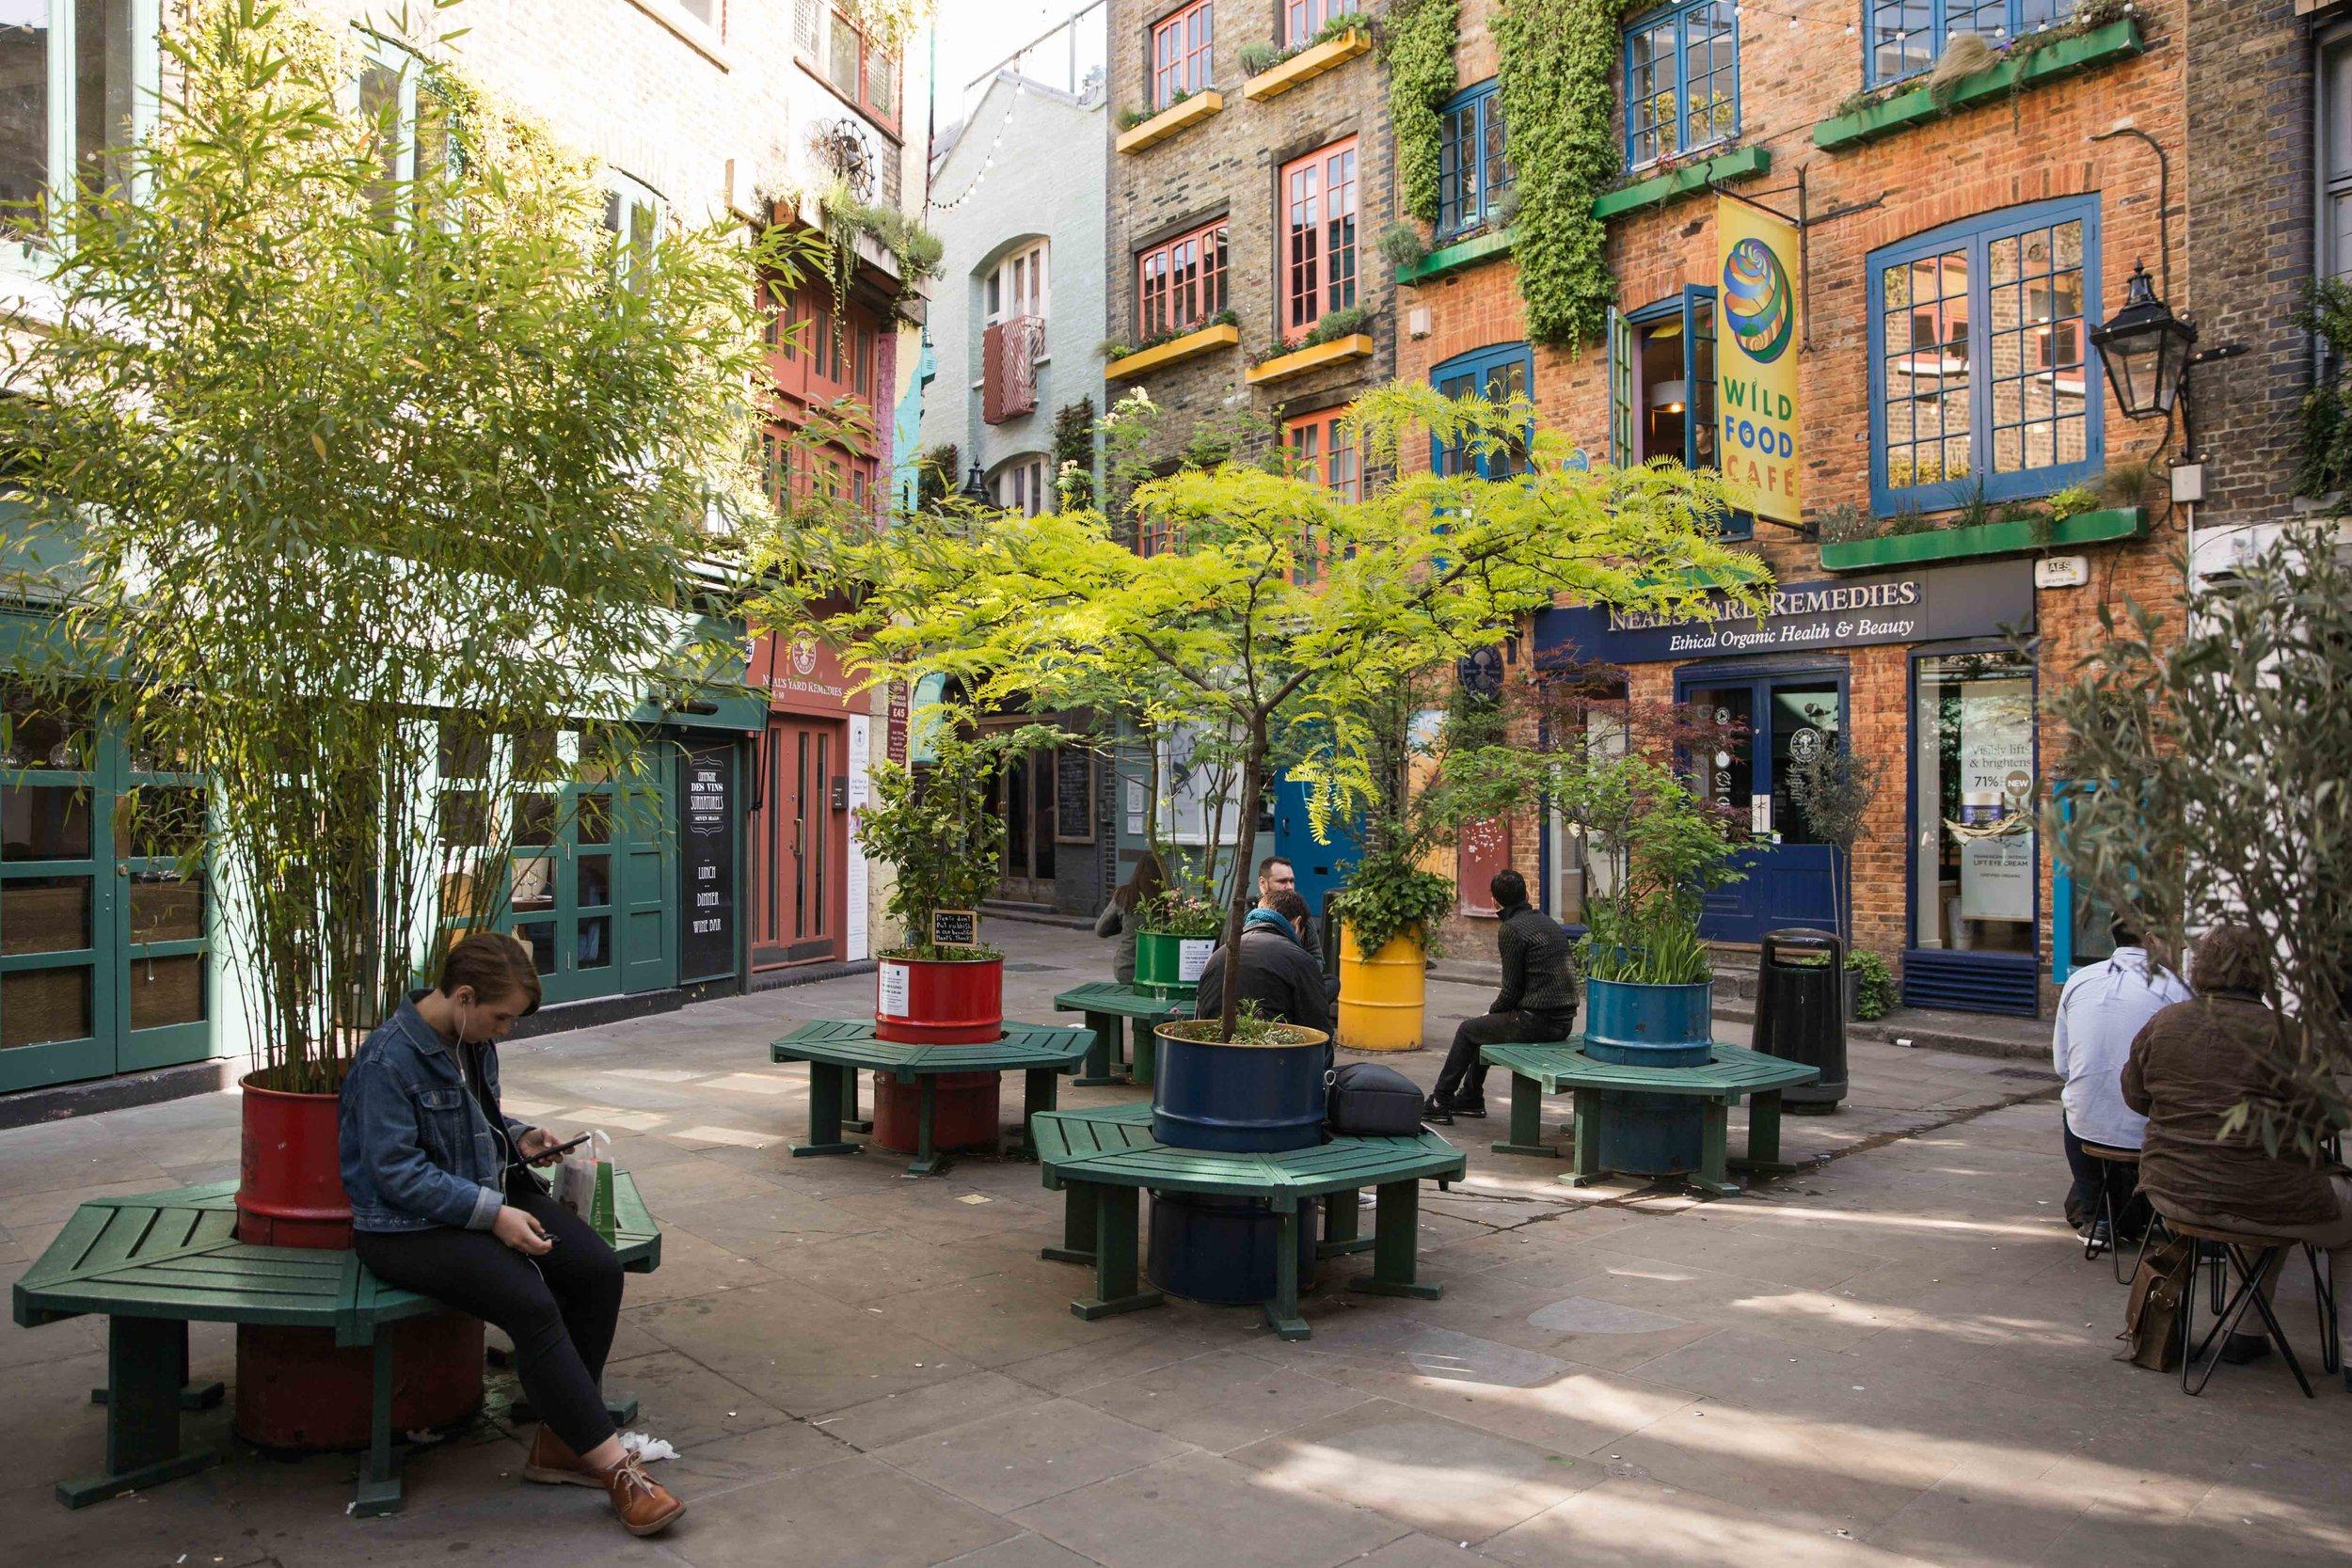 JCTP0104-Covent Garden-London-UK-mcconaghy-12.jpg